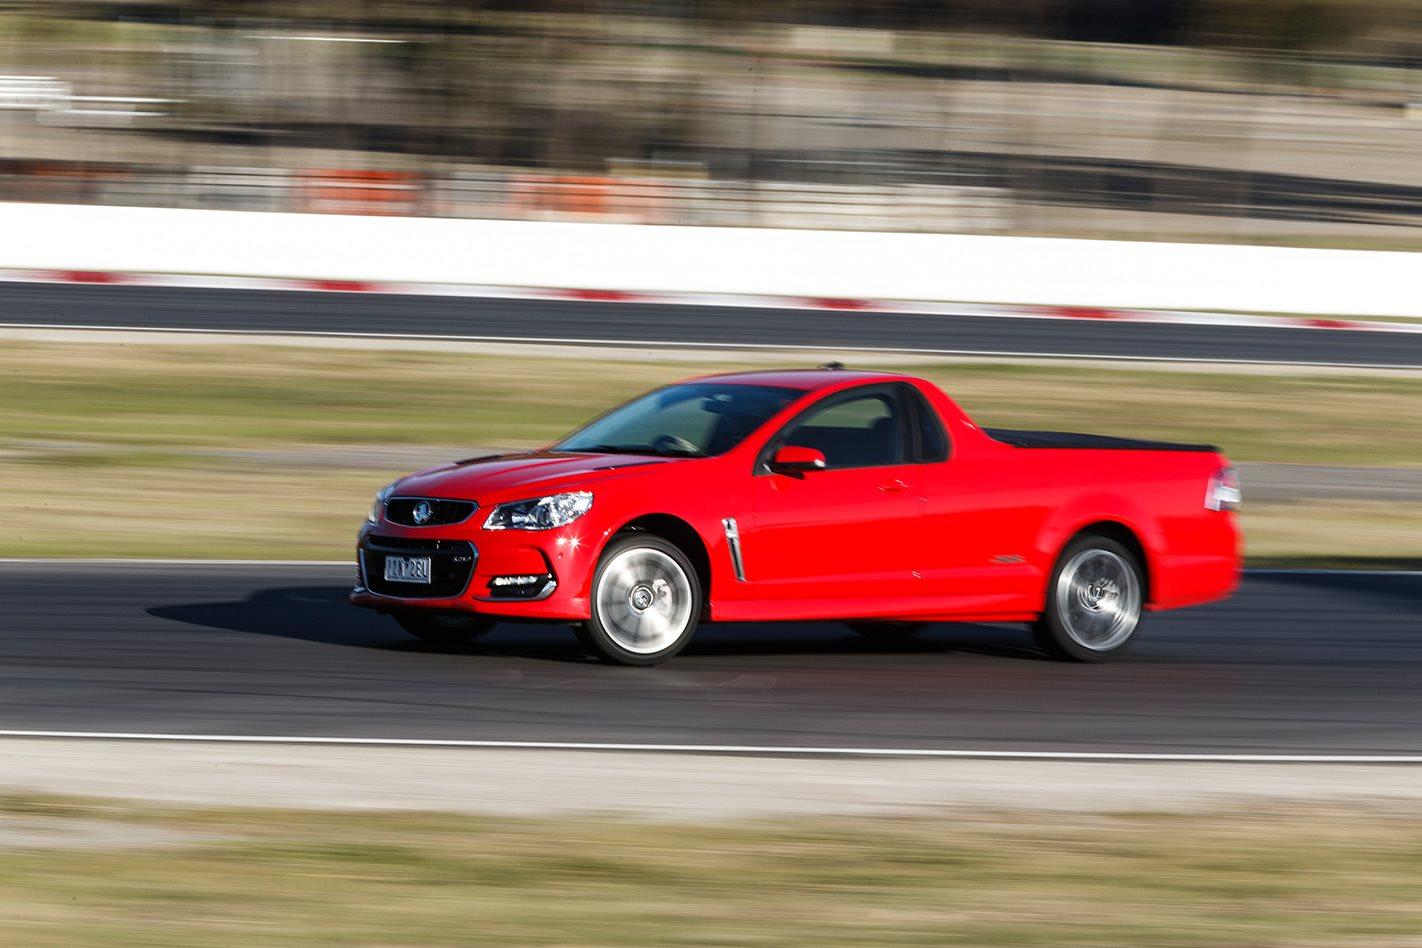 2017 Holden Commodore SS Ute speeding.jpg